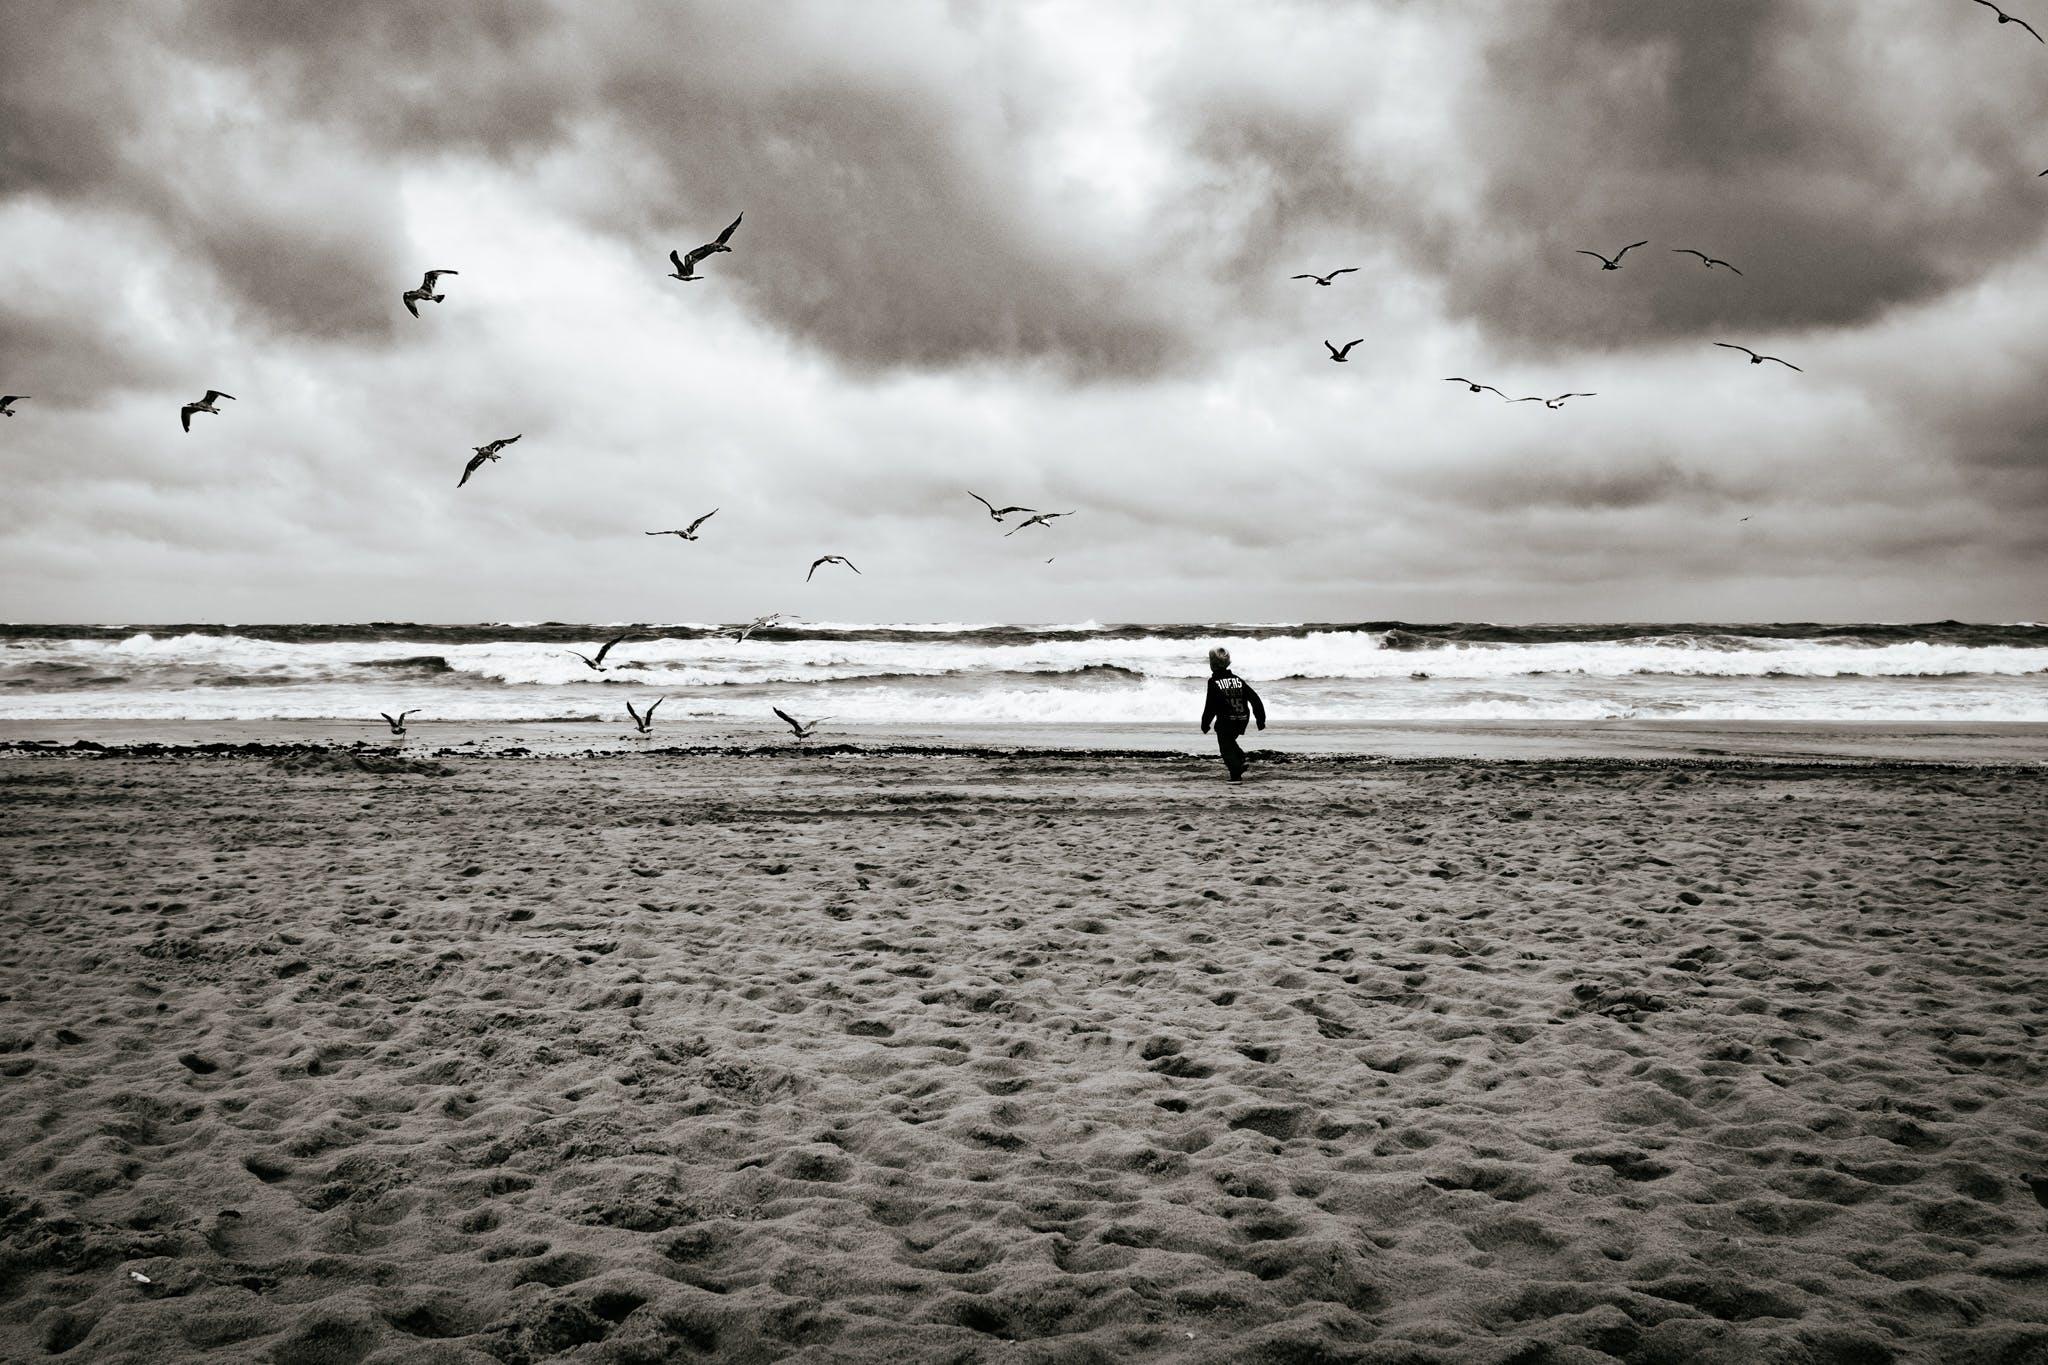 Grayscale Photography of Boy Running Near Sea